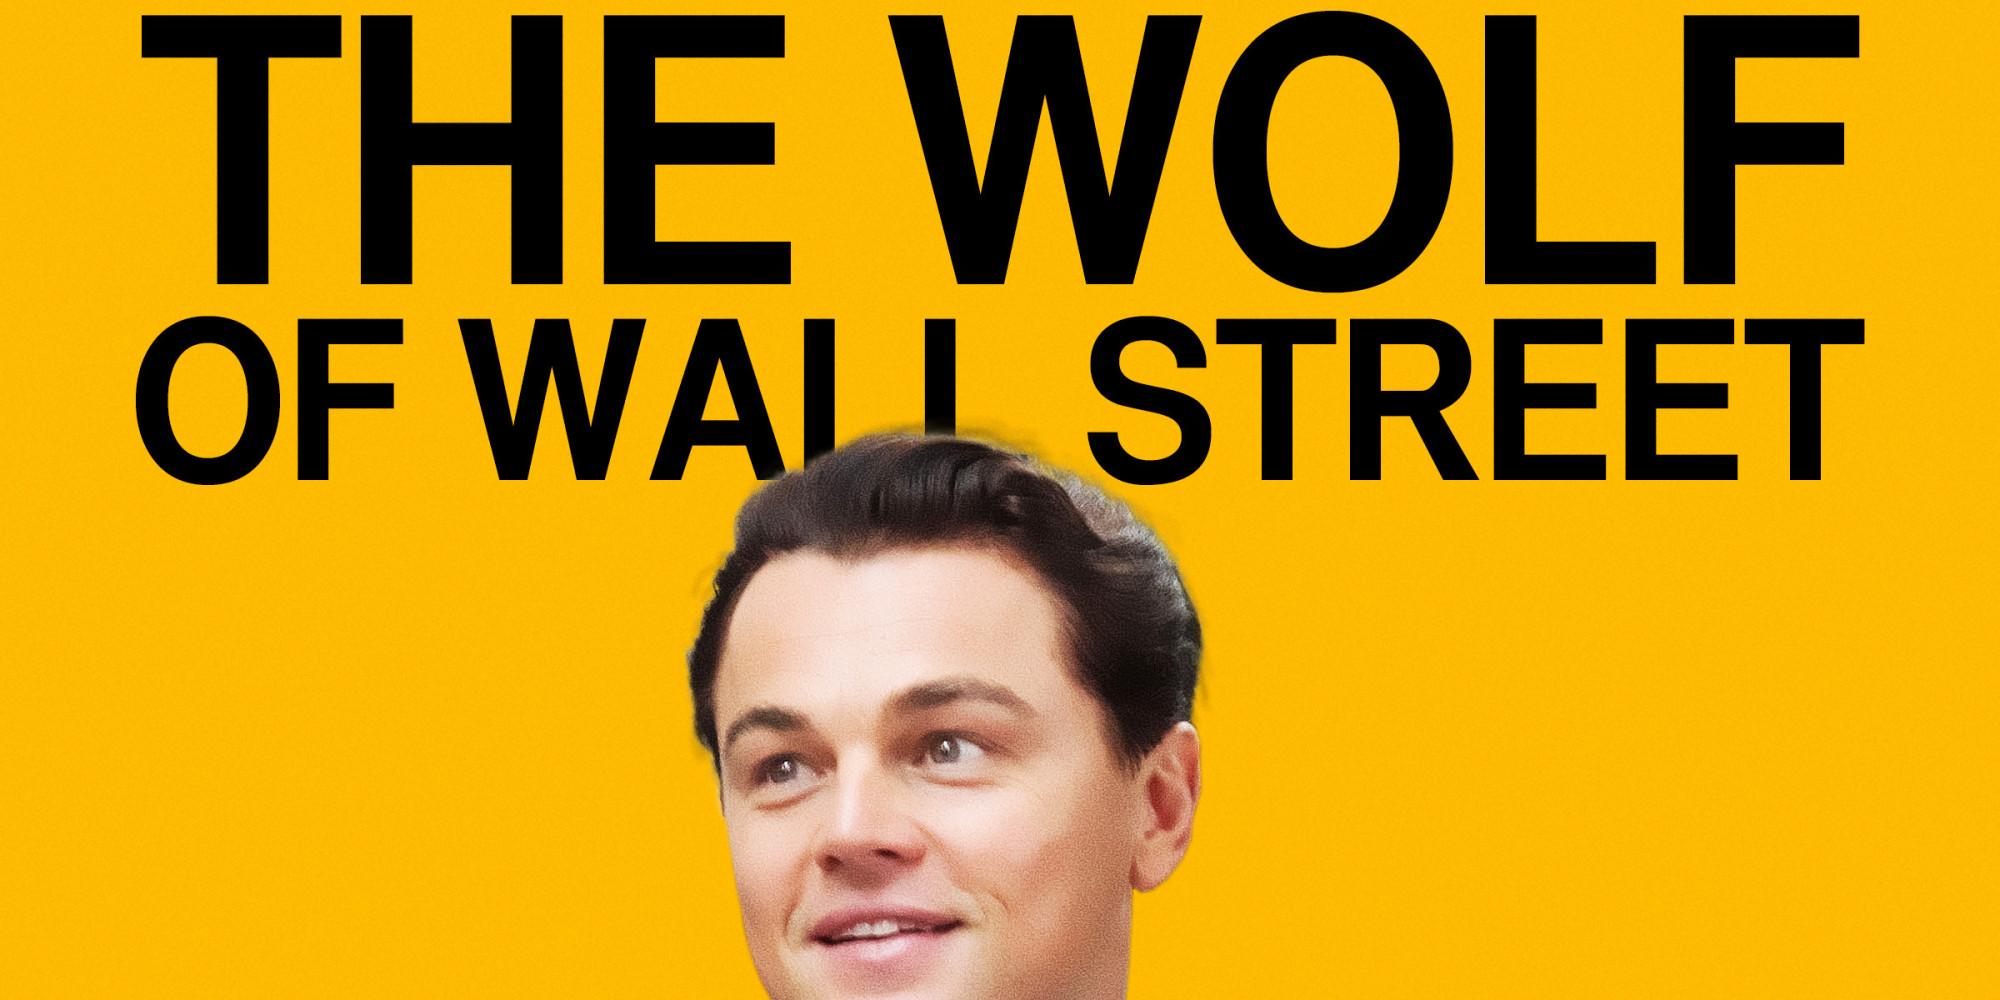 Regret, that, Wolf wall street movie